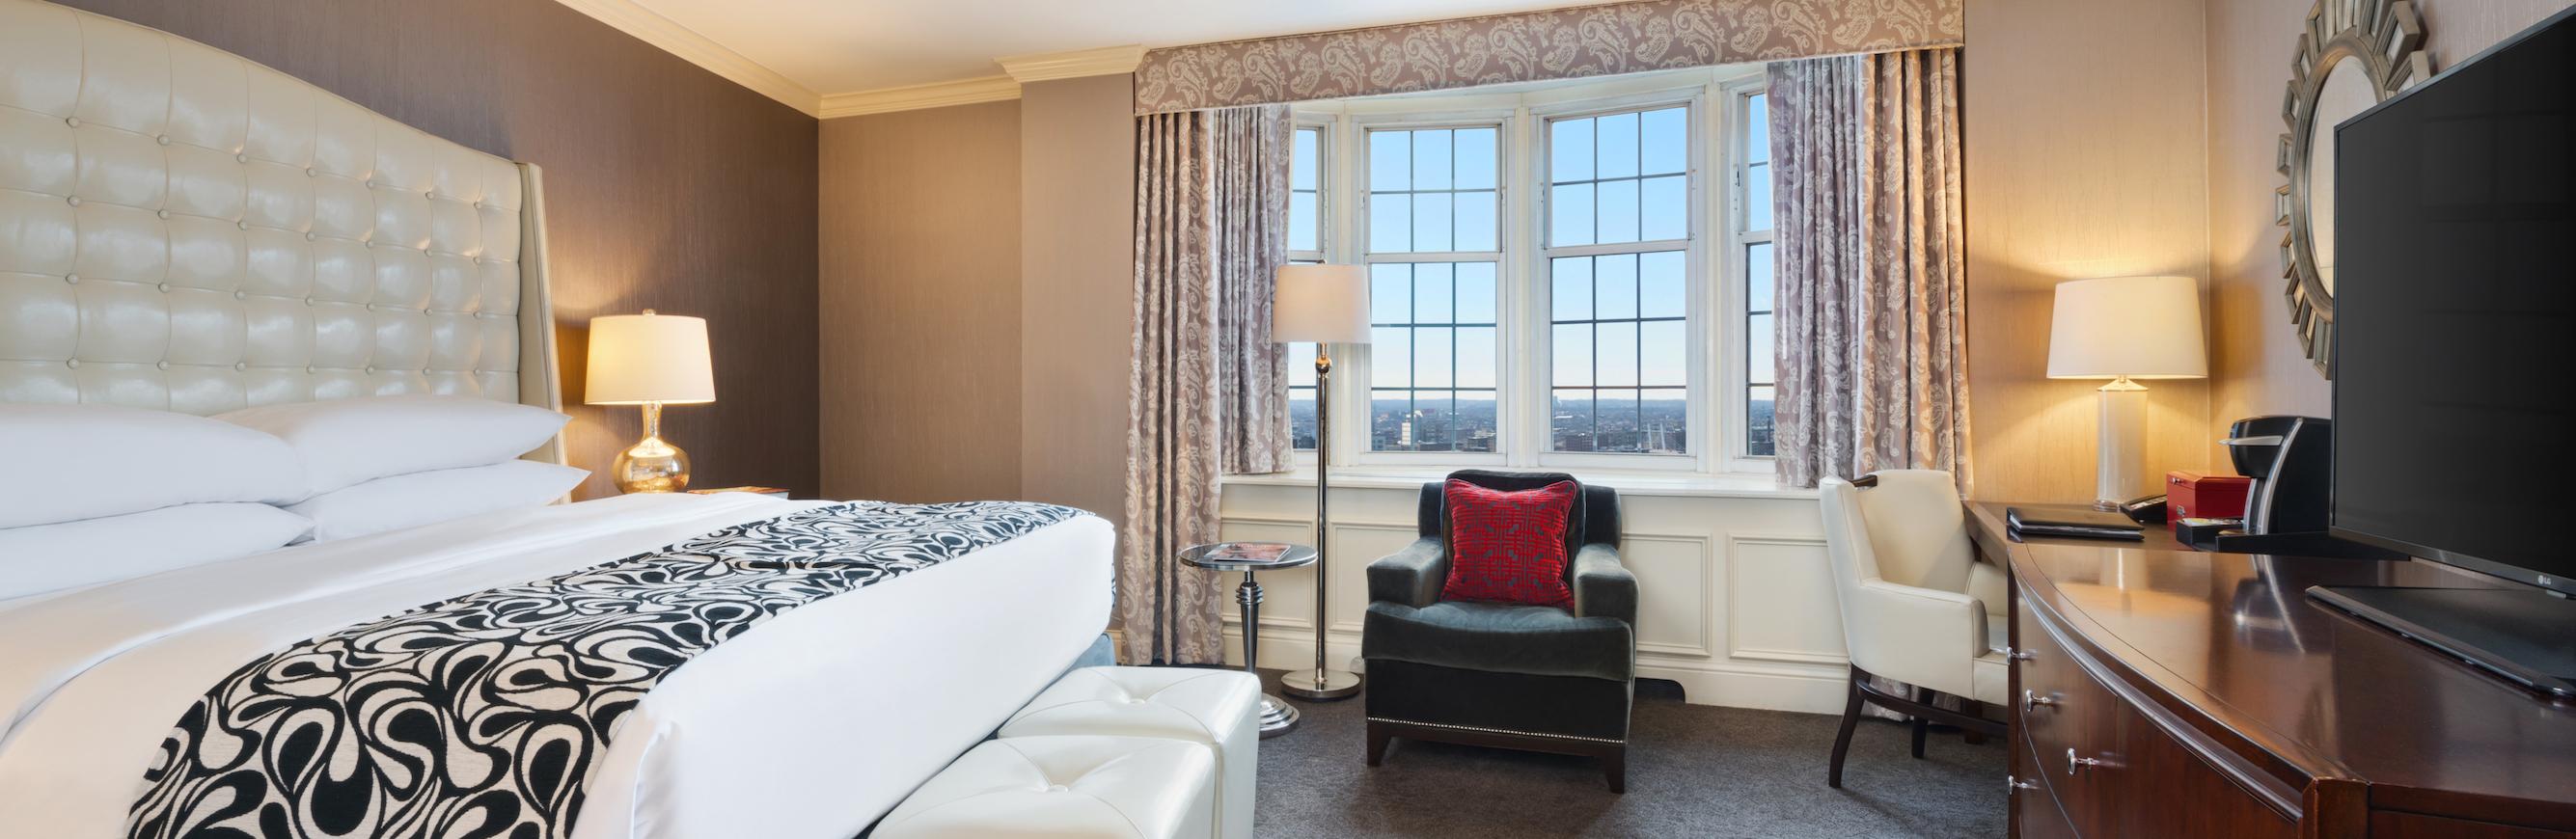 Pfister Hotel Accommodations in Milwaukee